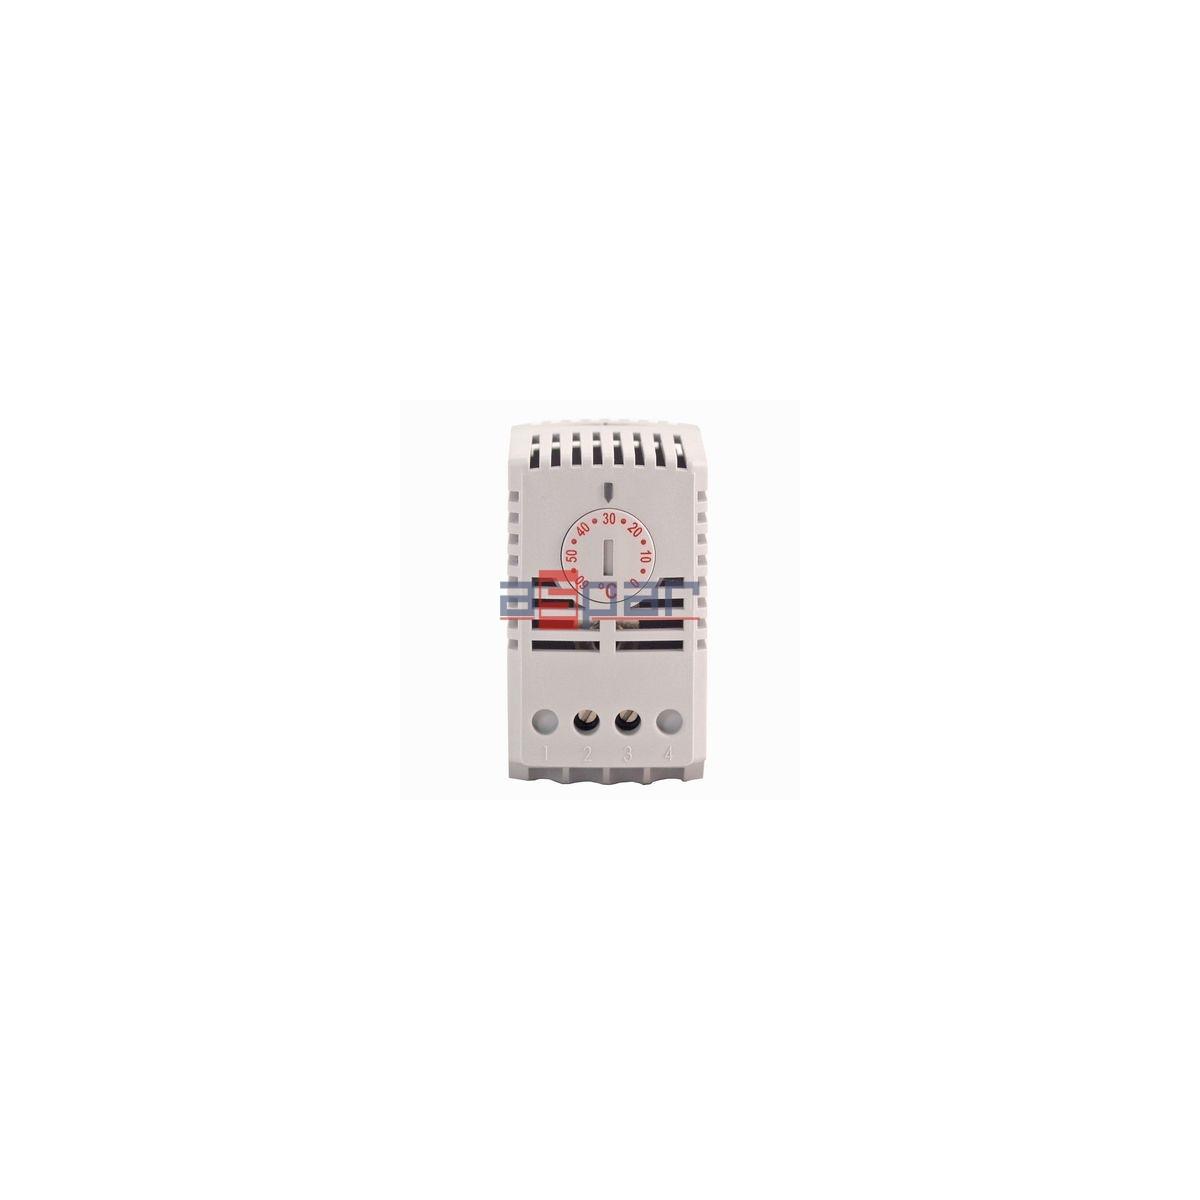 TRO 60 - thermostat NC